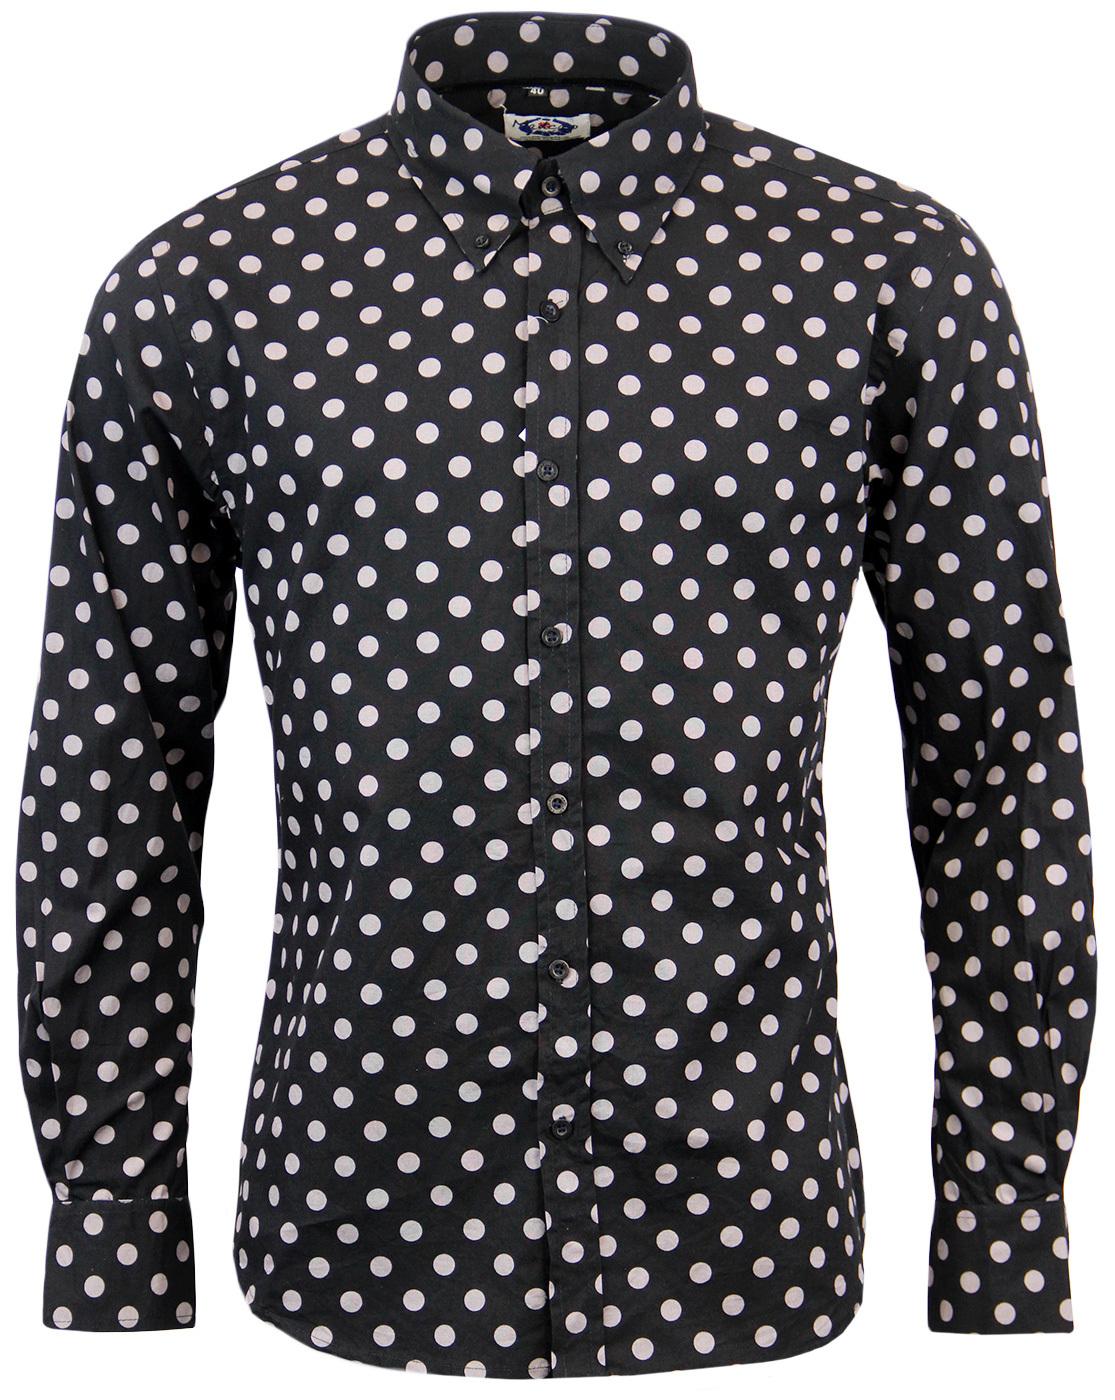 Penny Dot Lane Retro 60s Mod MADCAP Shirt (B/G)